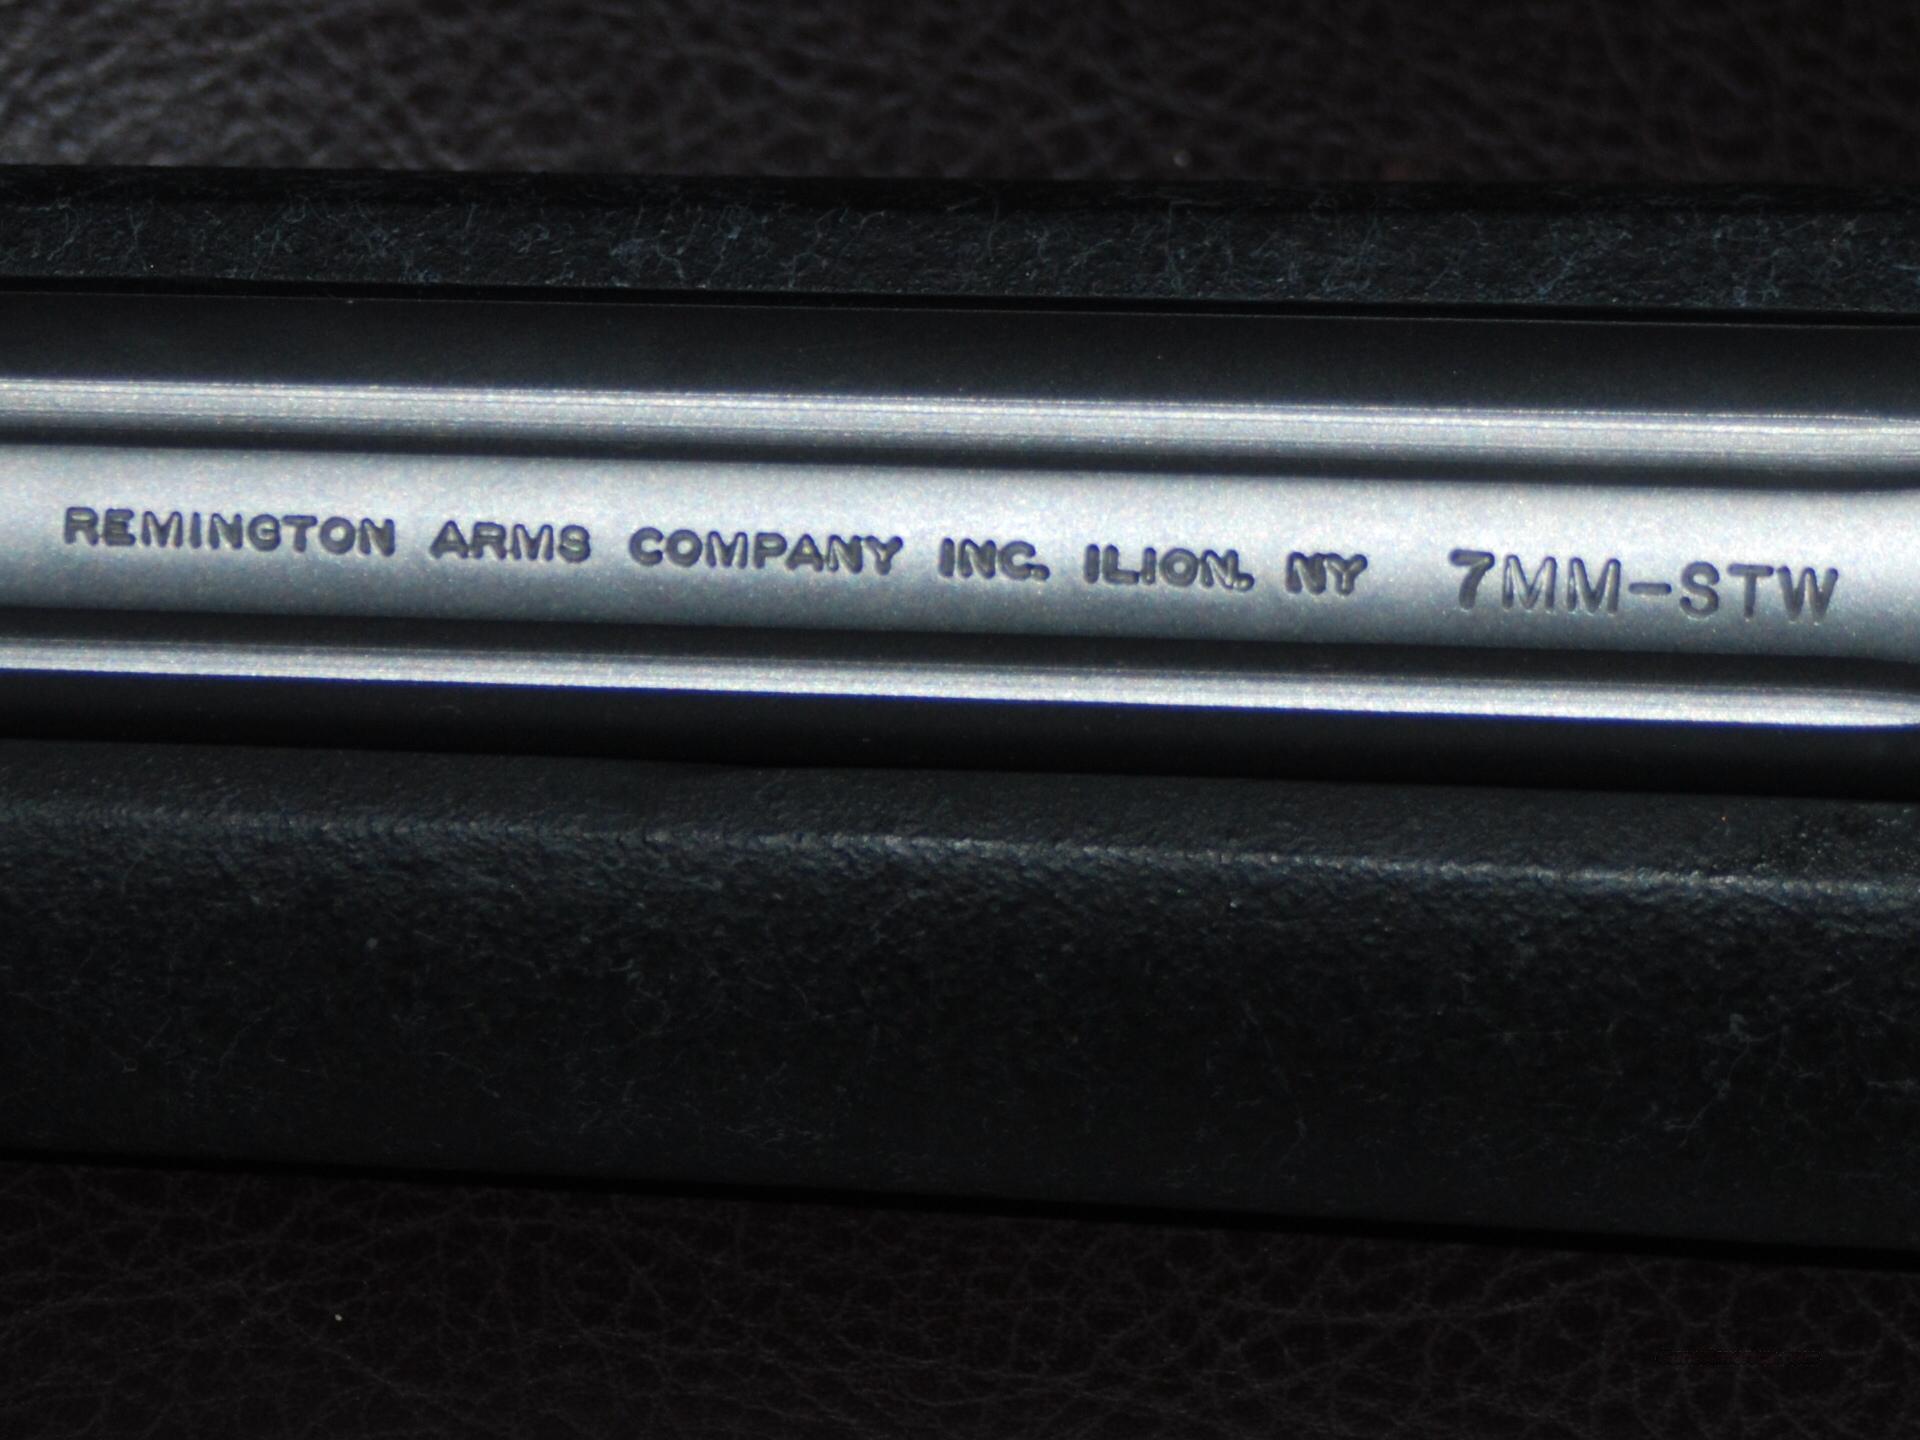 Sendero 7mm stw guns gt rifles gt remington rifles modern gt model 700